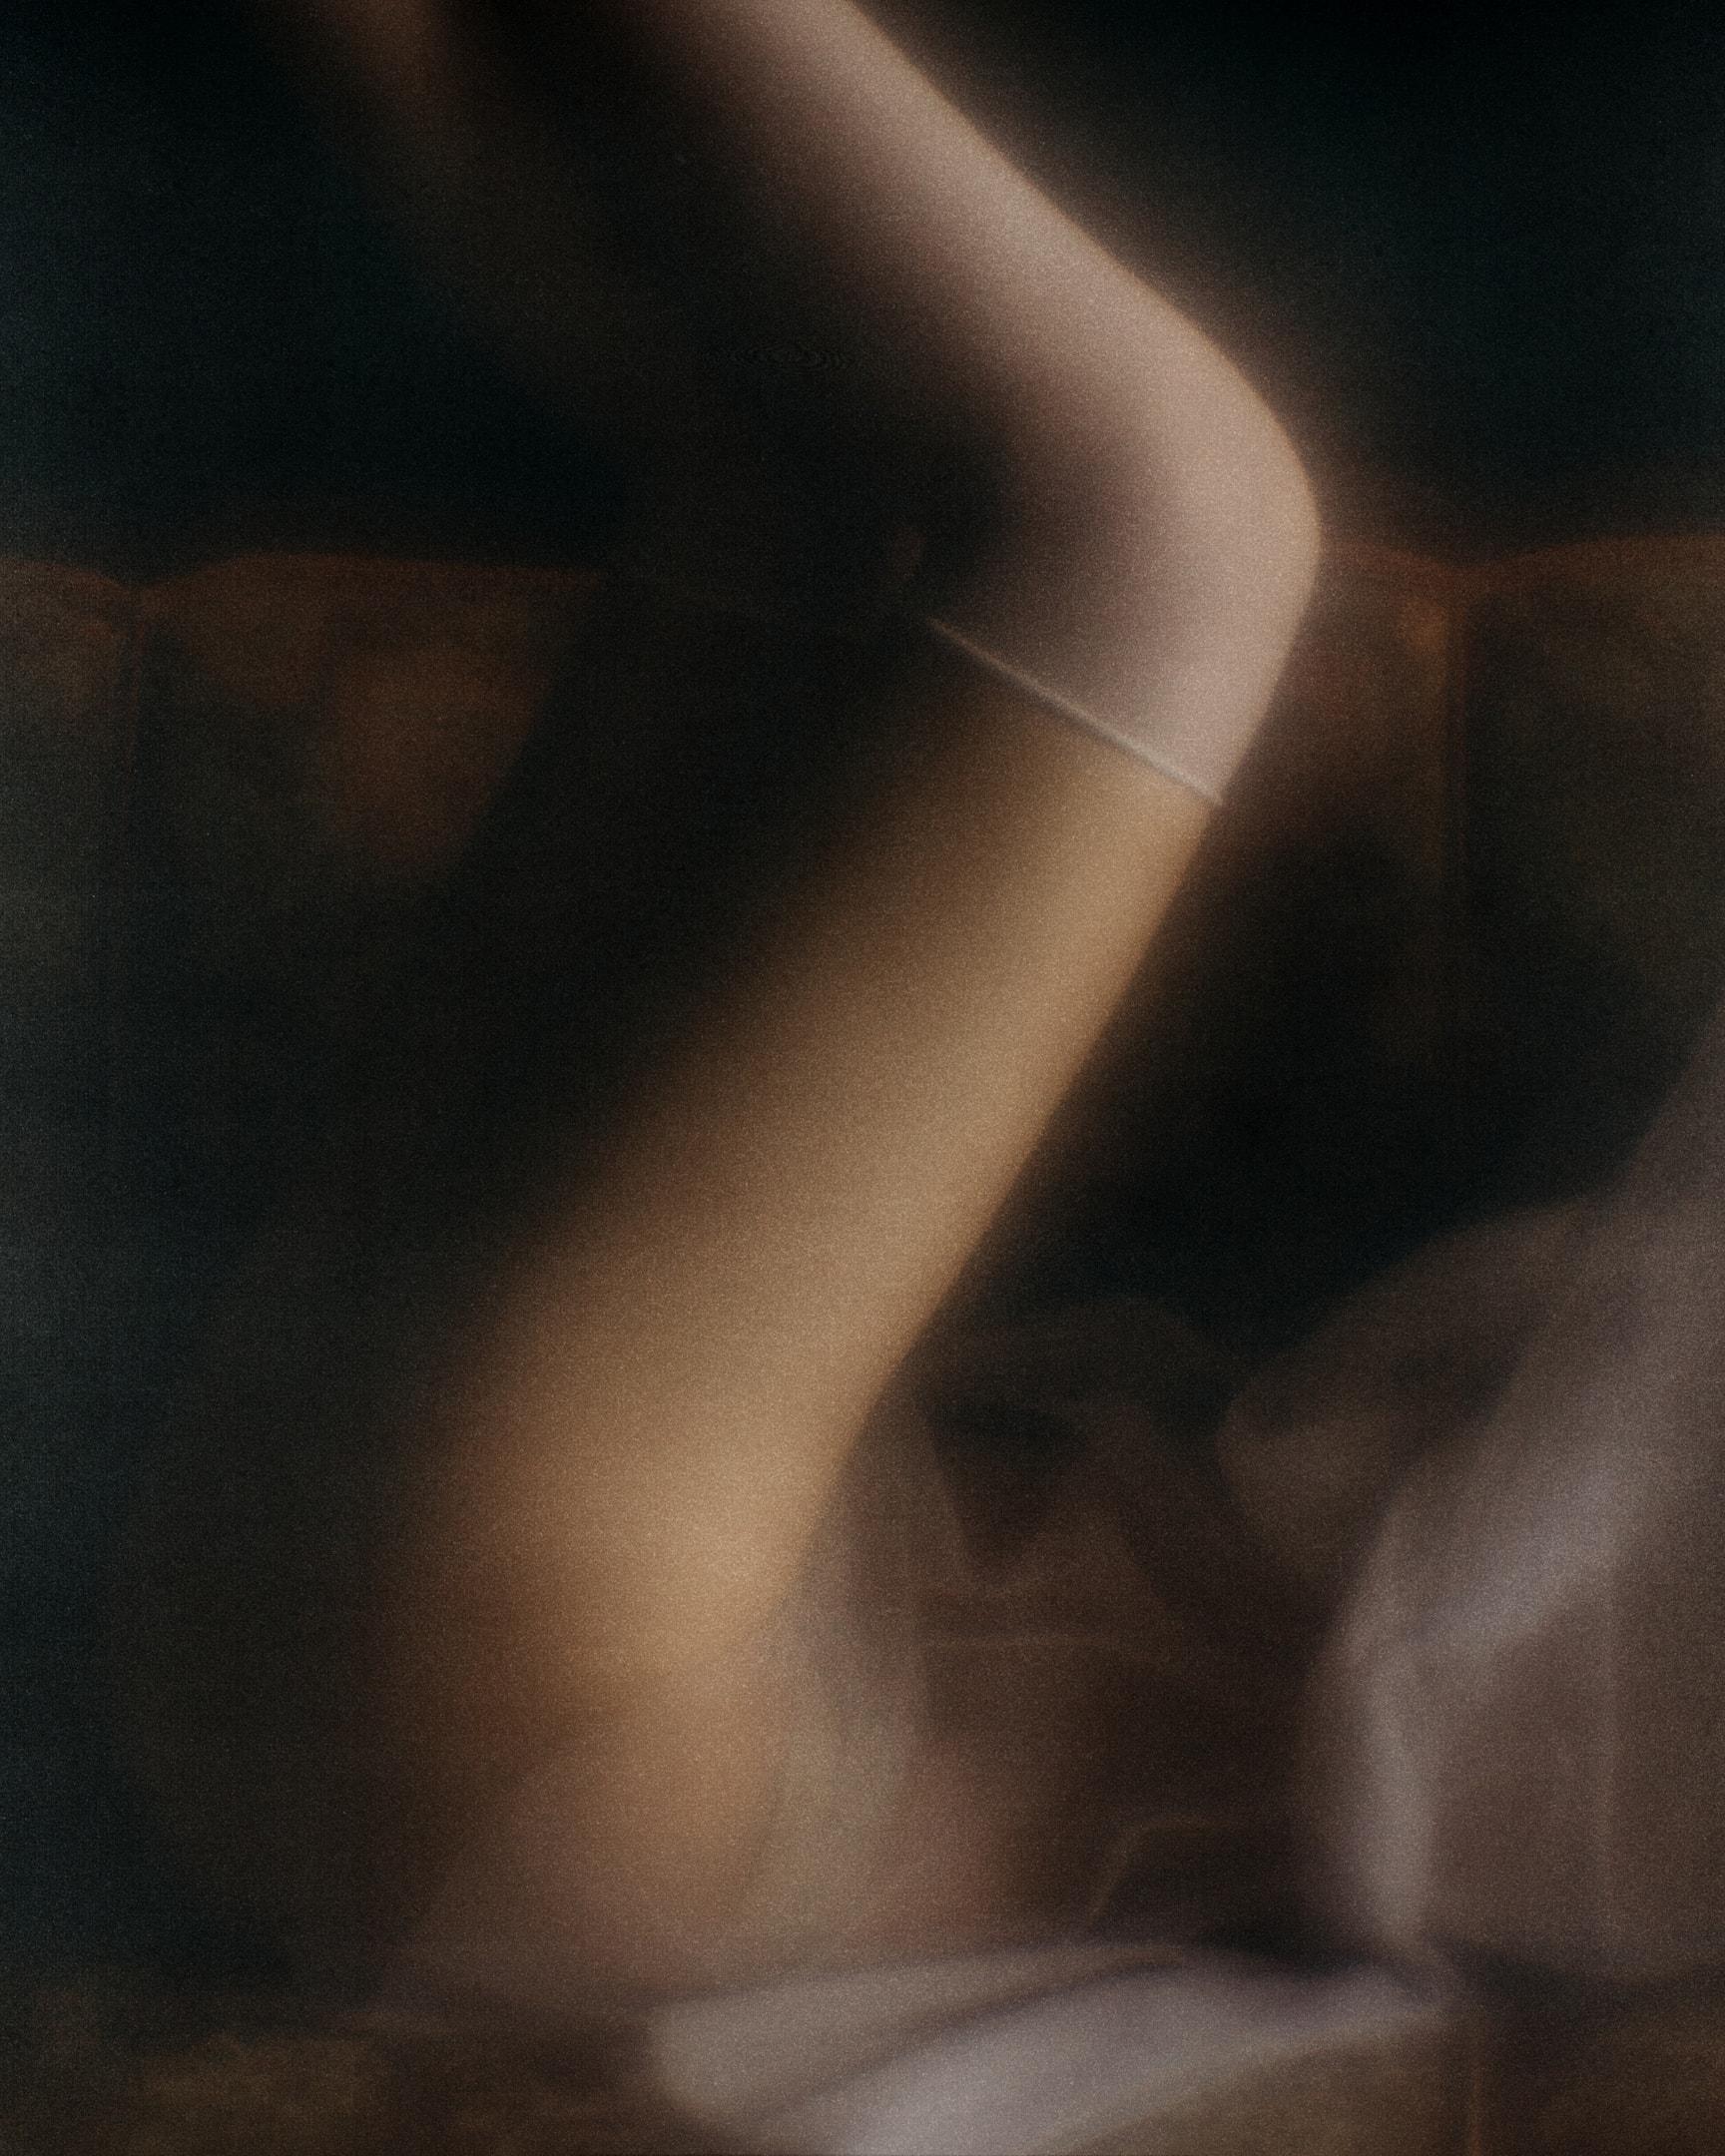 Kristiina by Viktoria Zolotovskaya